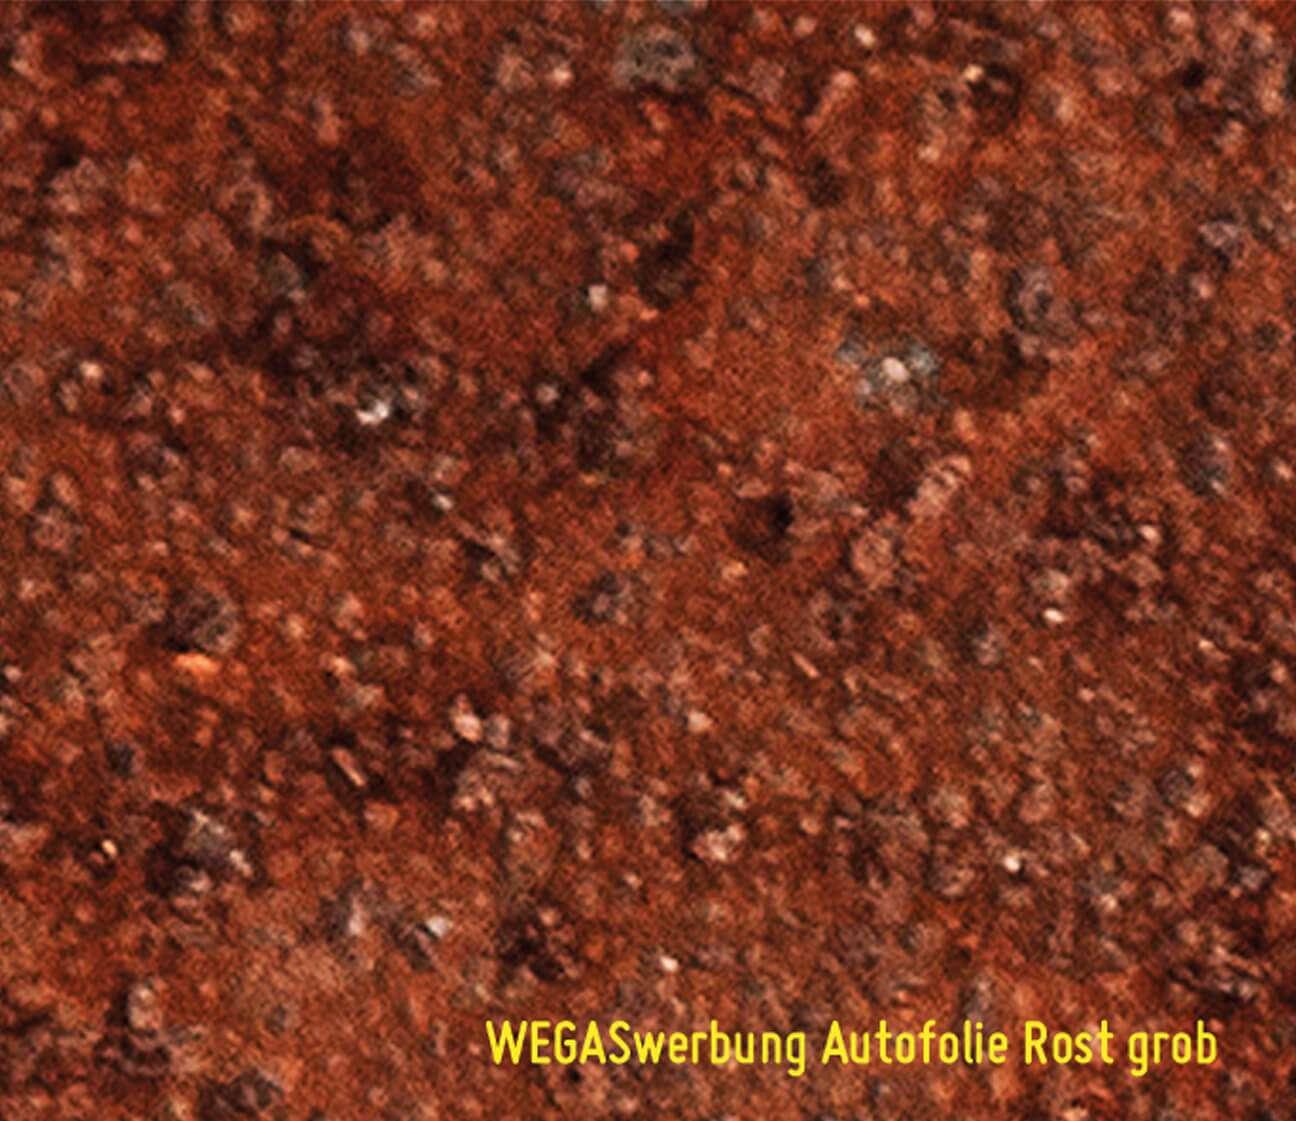 Autofolie Rost aufgeblueht Muster grob A4 1280x1280 2x